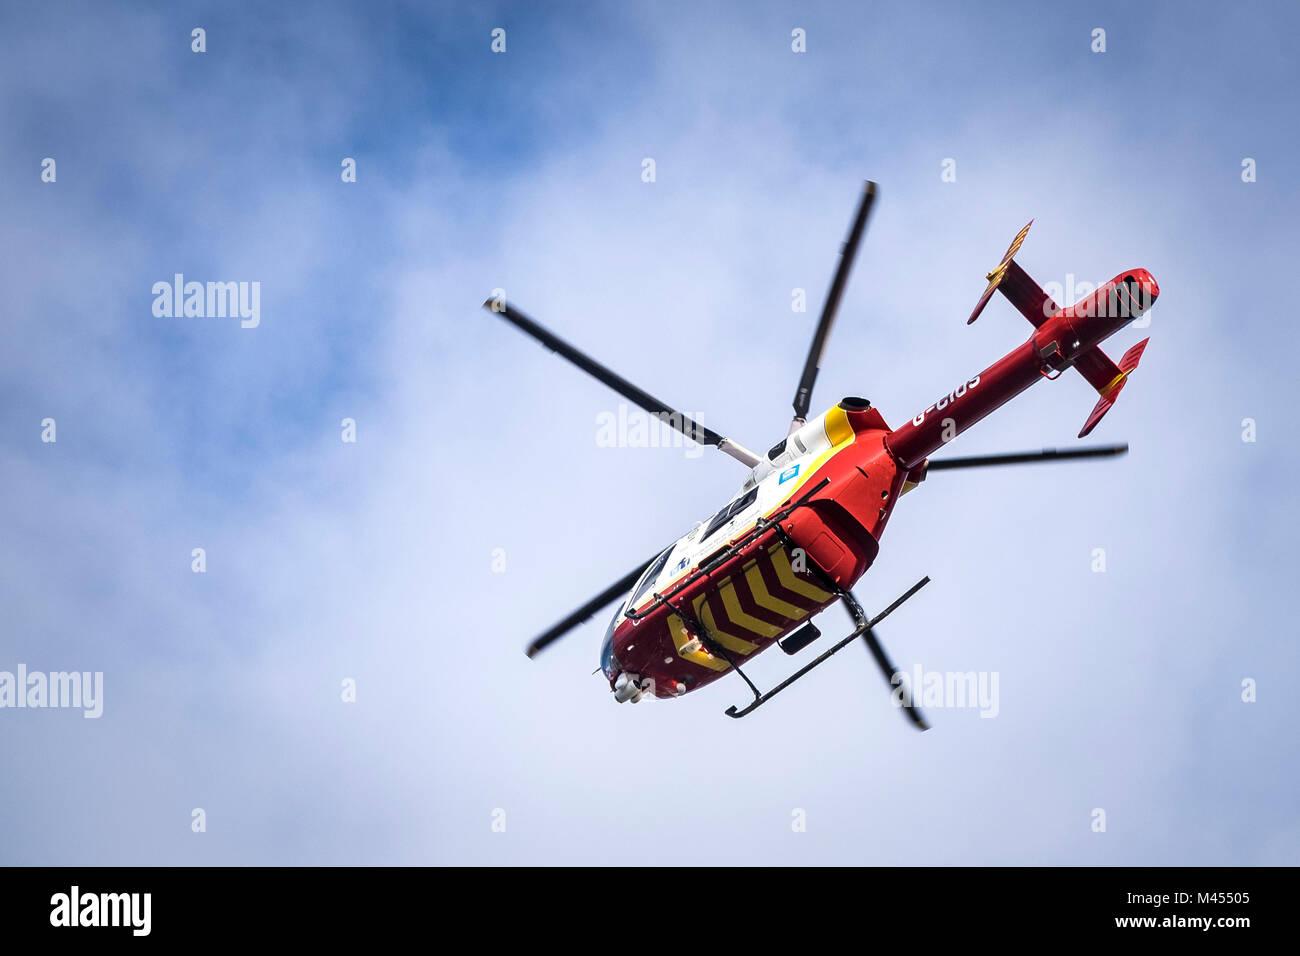 Die Cornwall Air Ambulance helicopter McDonnell Douglas MD 902 Explorer flying Overhead. Stockbild